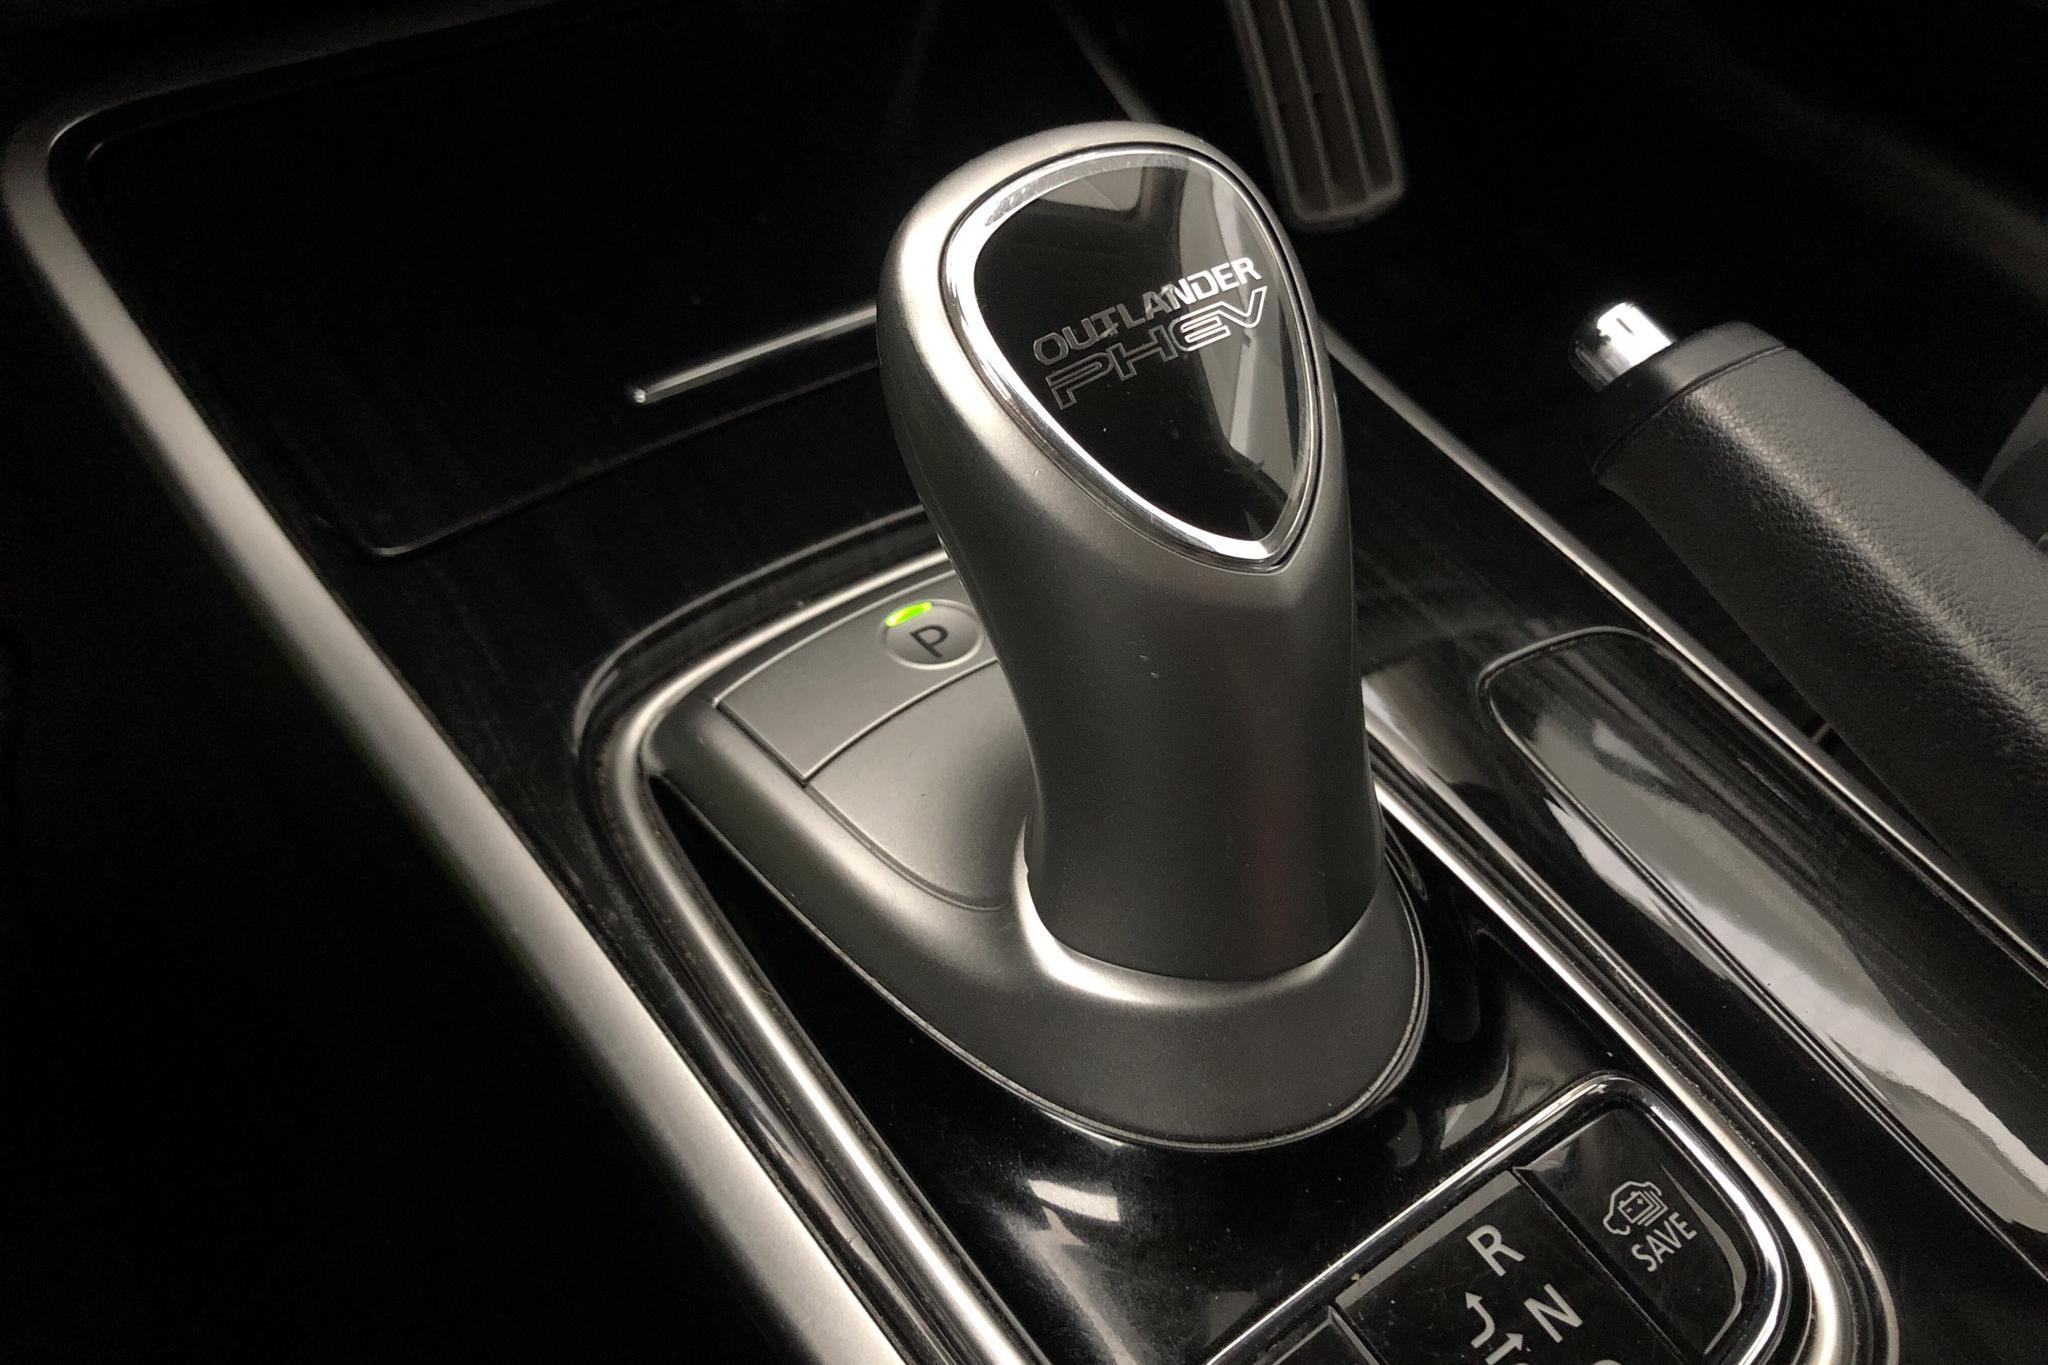 Mitsubishi Outlander 2.0 Plug-in Hybrid 4WD (121hk) - 91 600 km - Automatic - black - 2016